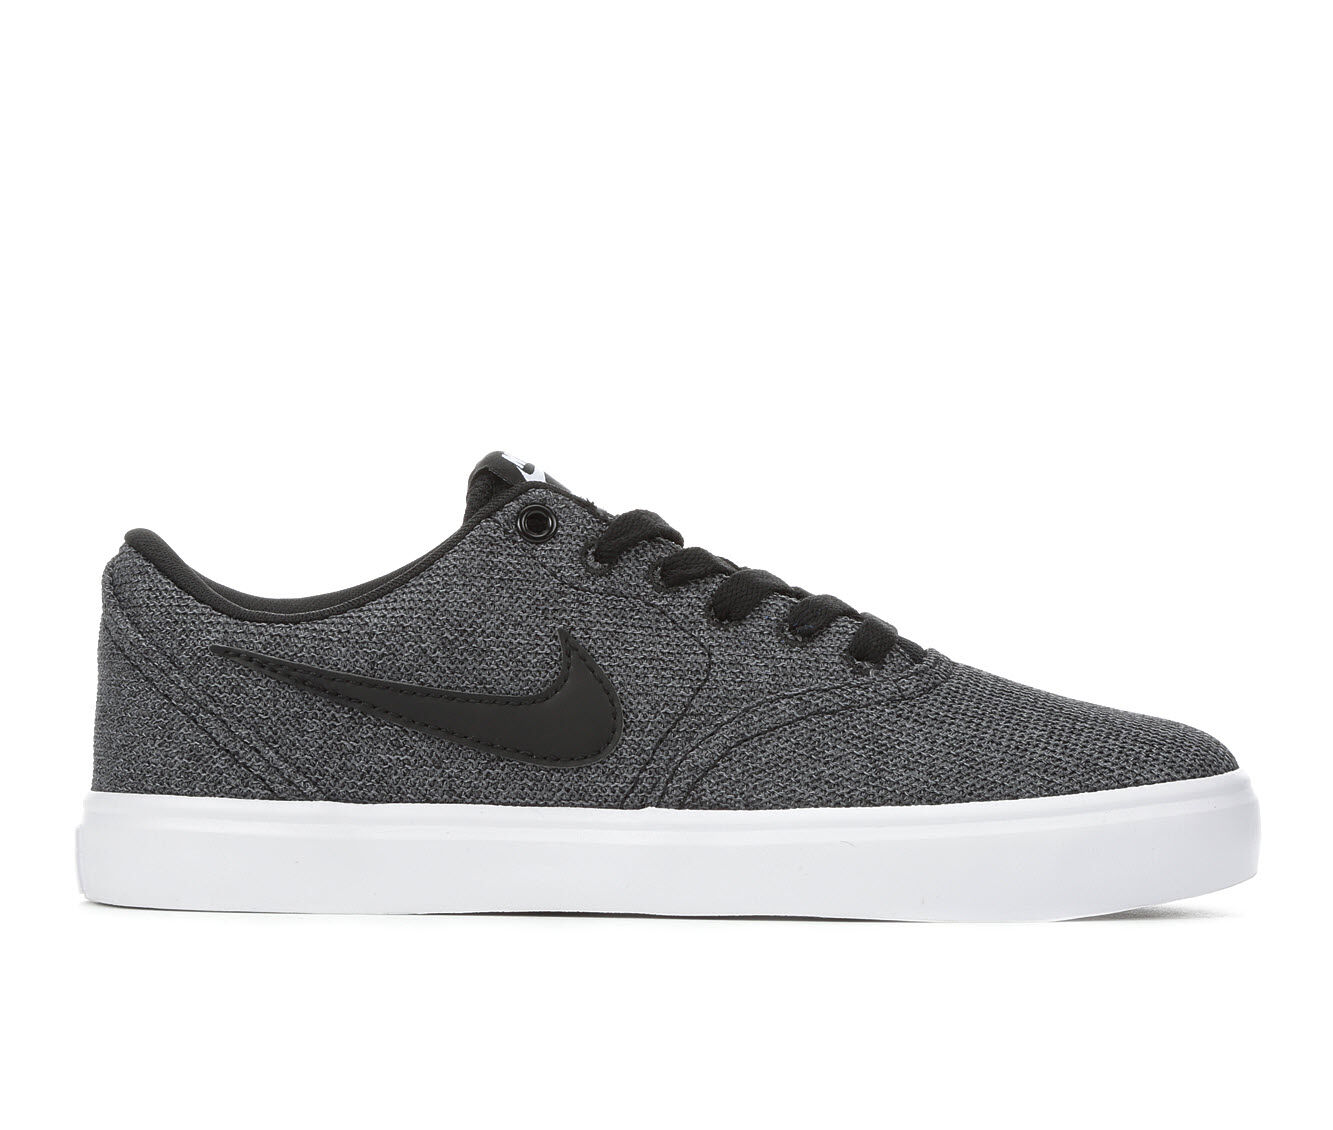 Special Offer Women's Nike Solar Check Canvas Prem Skate Shoes Black/Grey/Wht